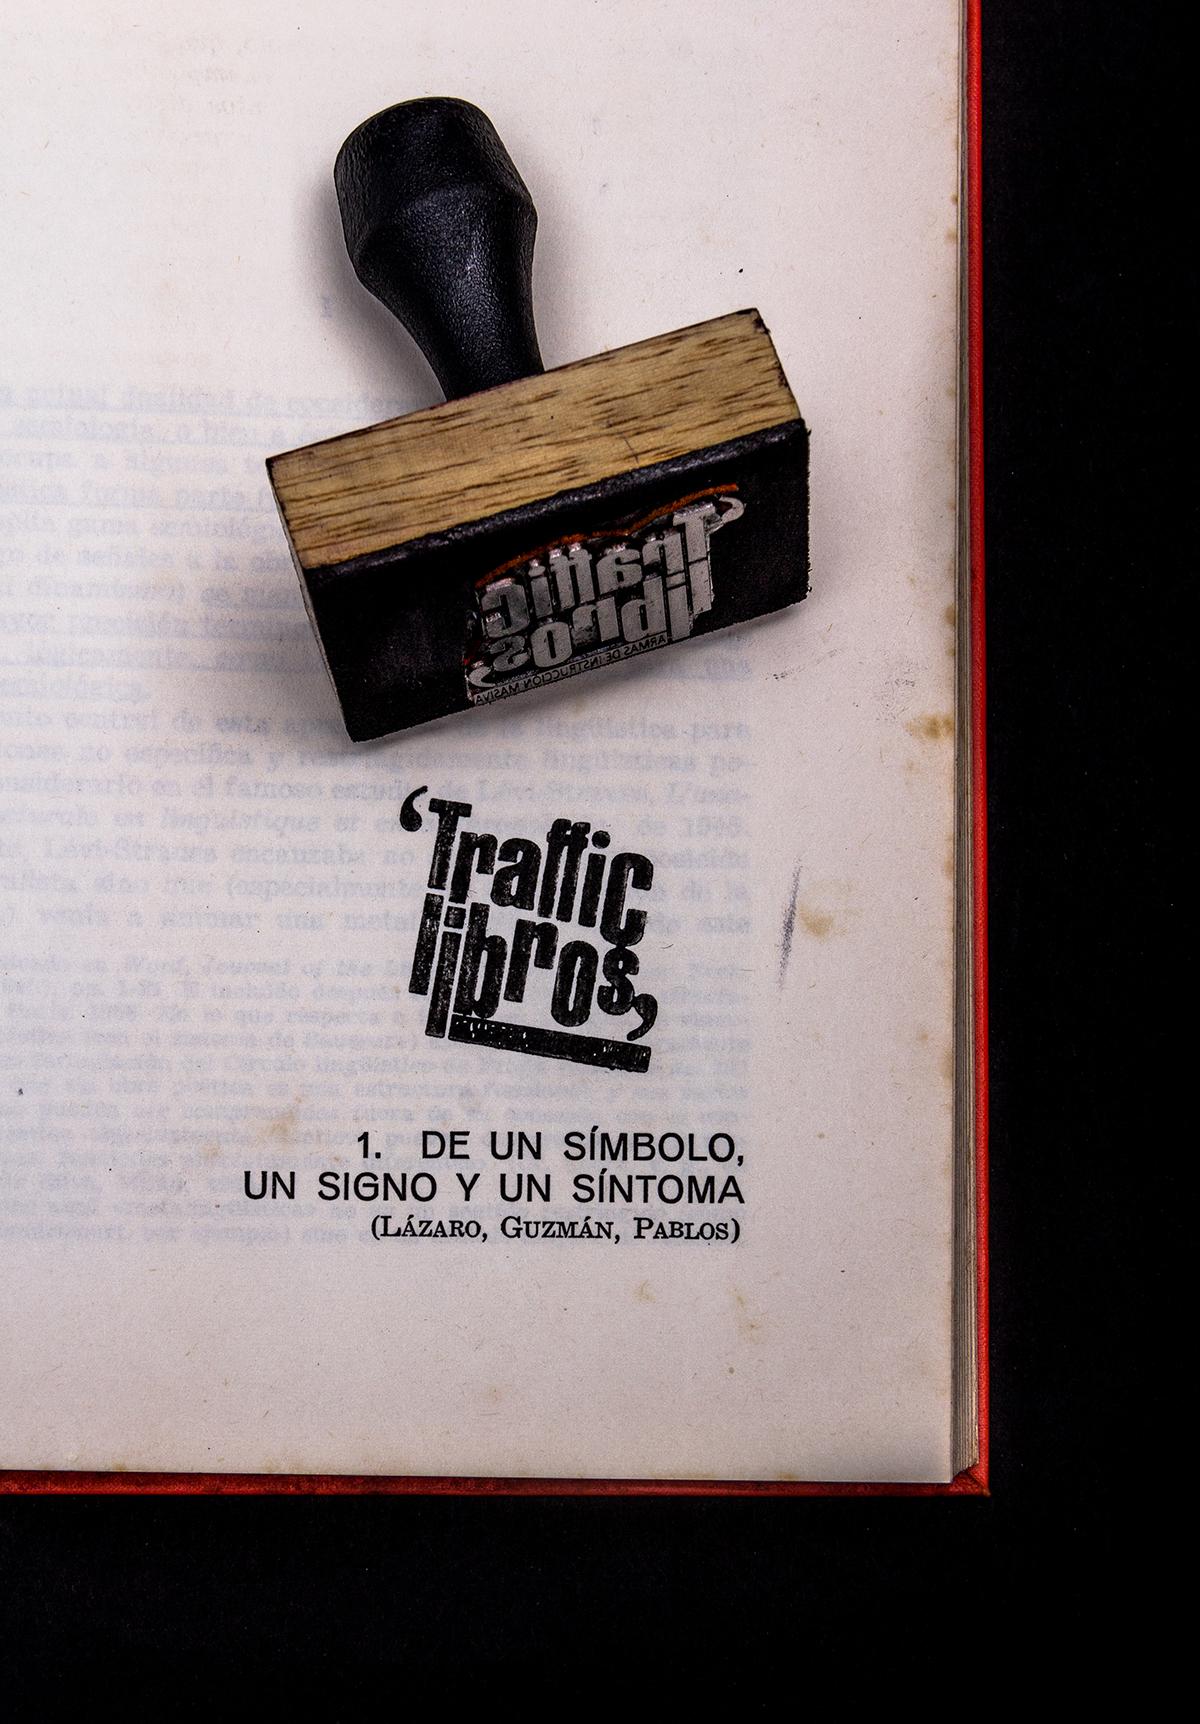 traffic libros-29